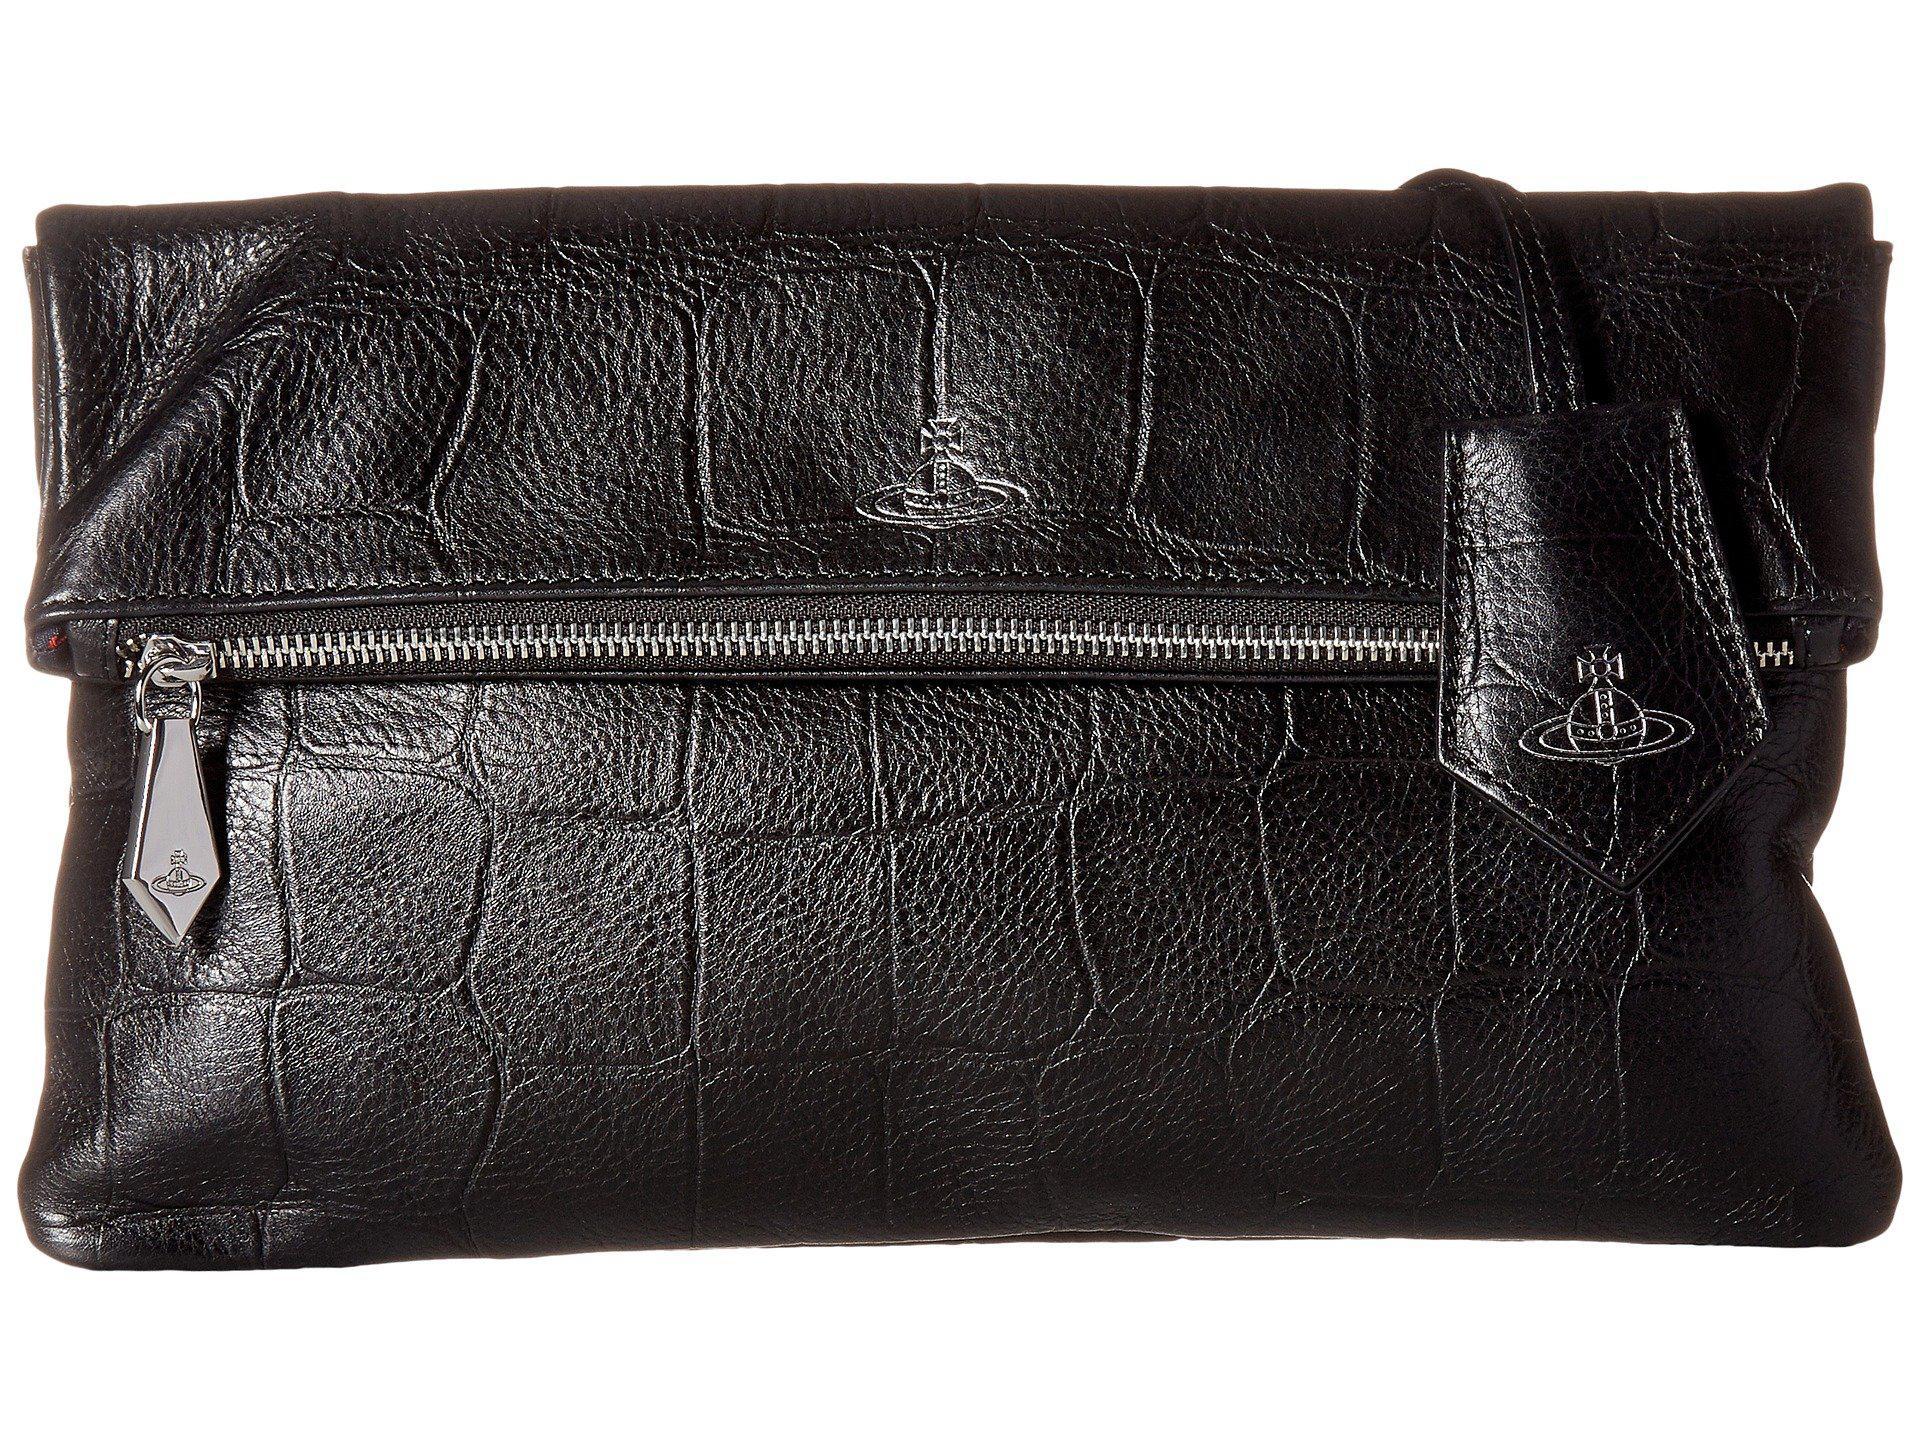 98d95c9f60 Vivienne Westwood Canterbury Clutch in Black - Lyst